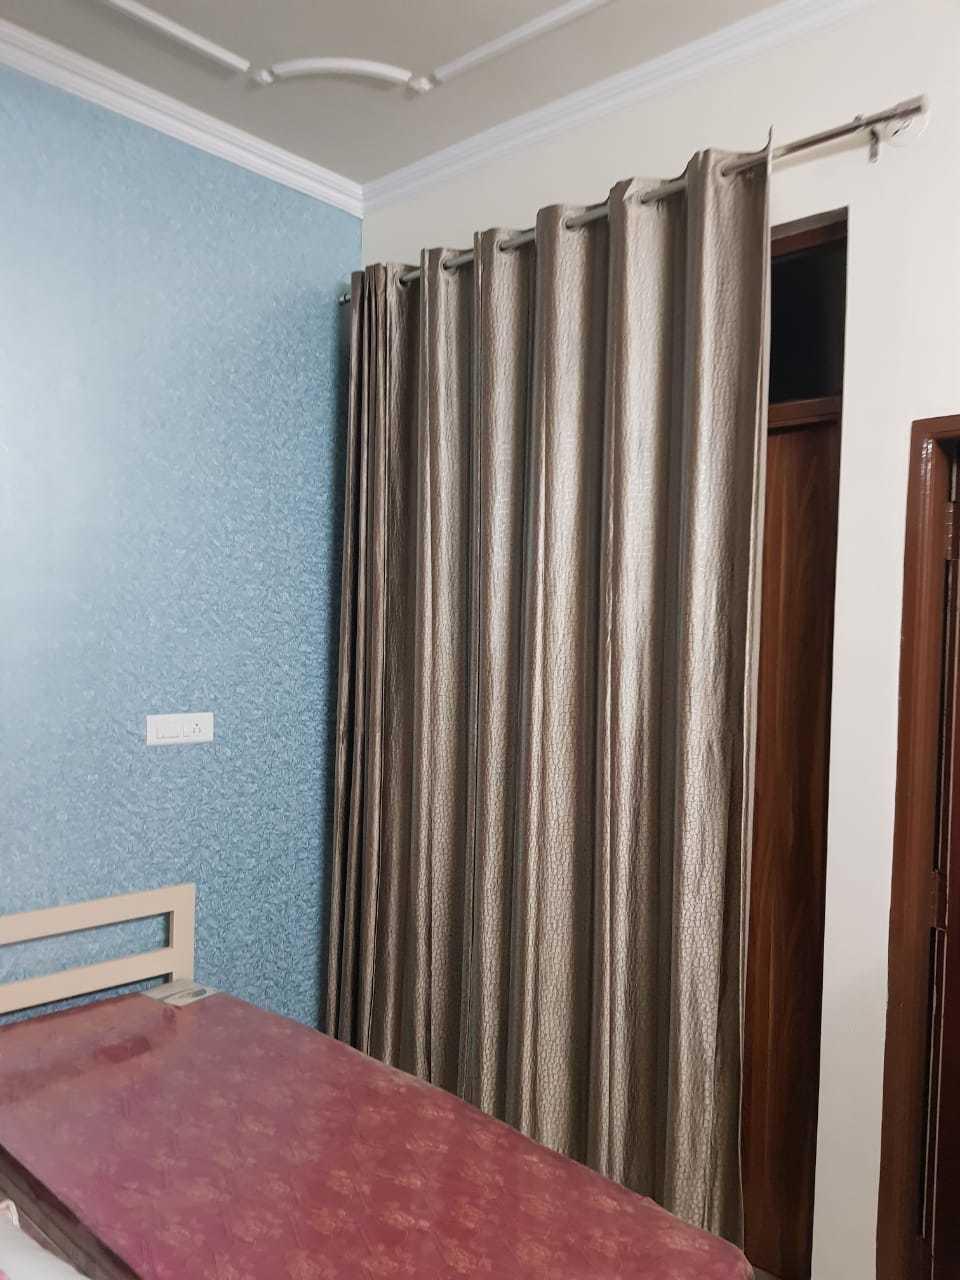 Aqueens Girls Hostel - Jagatpura, Jaipur